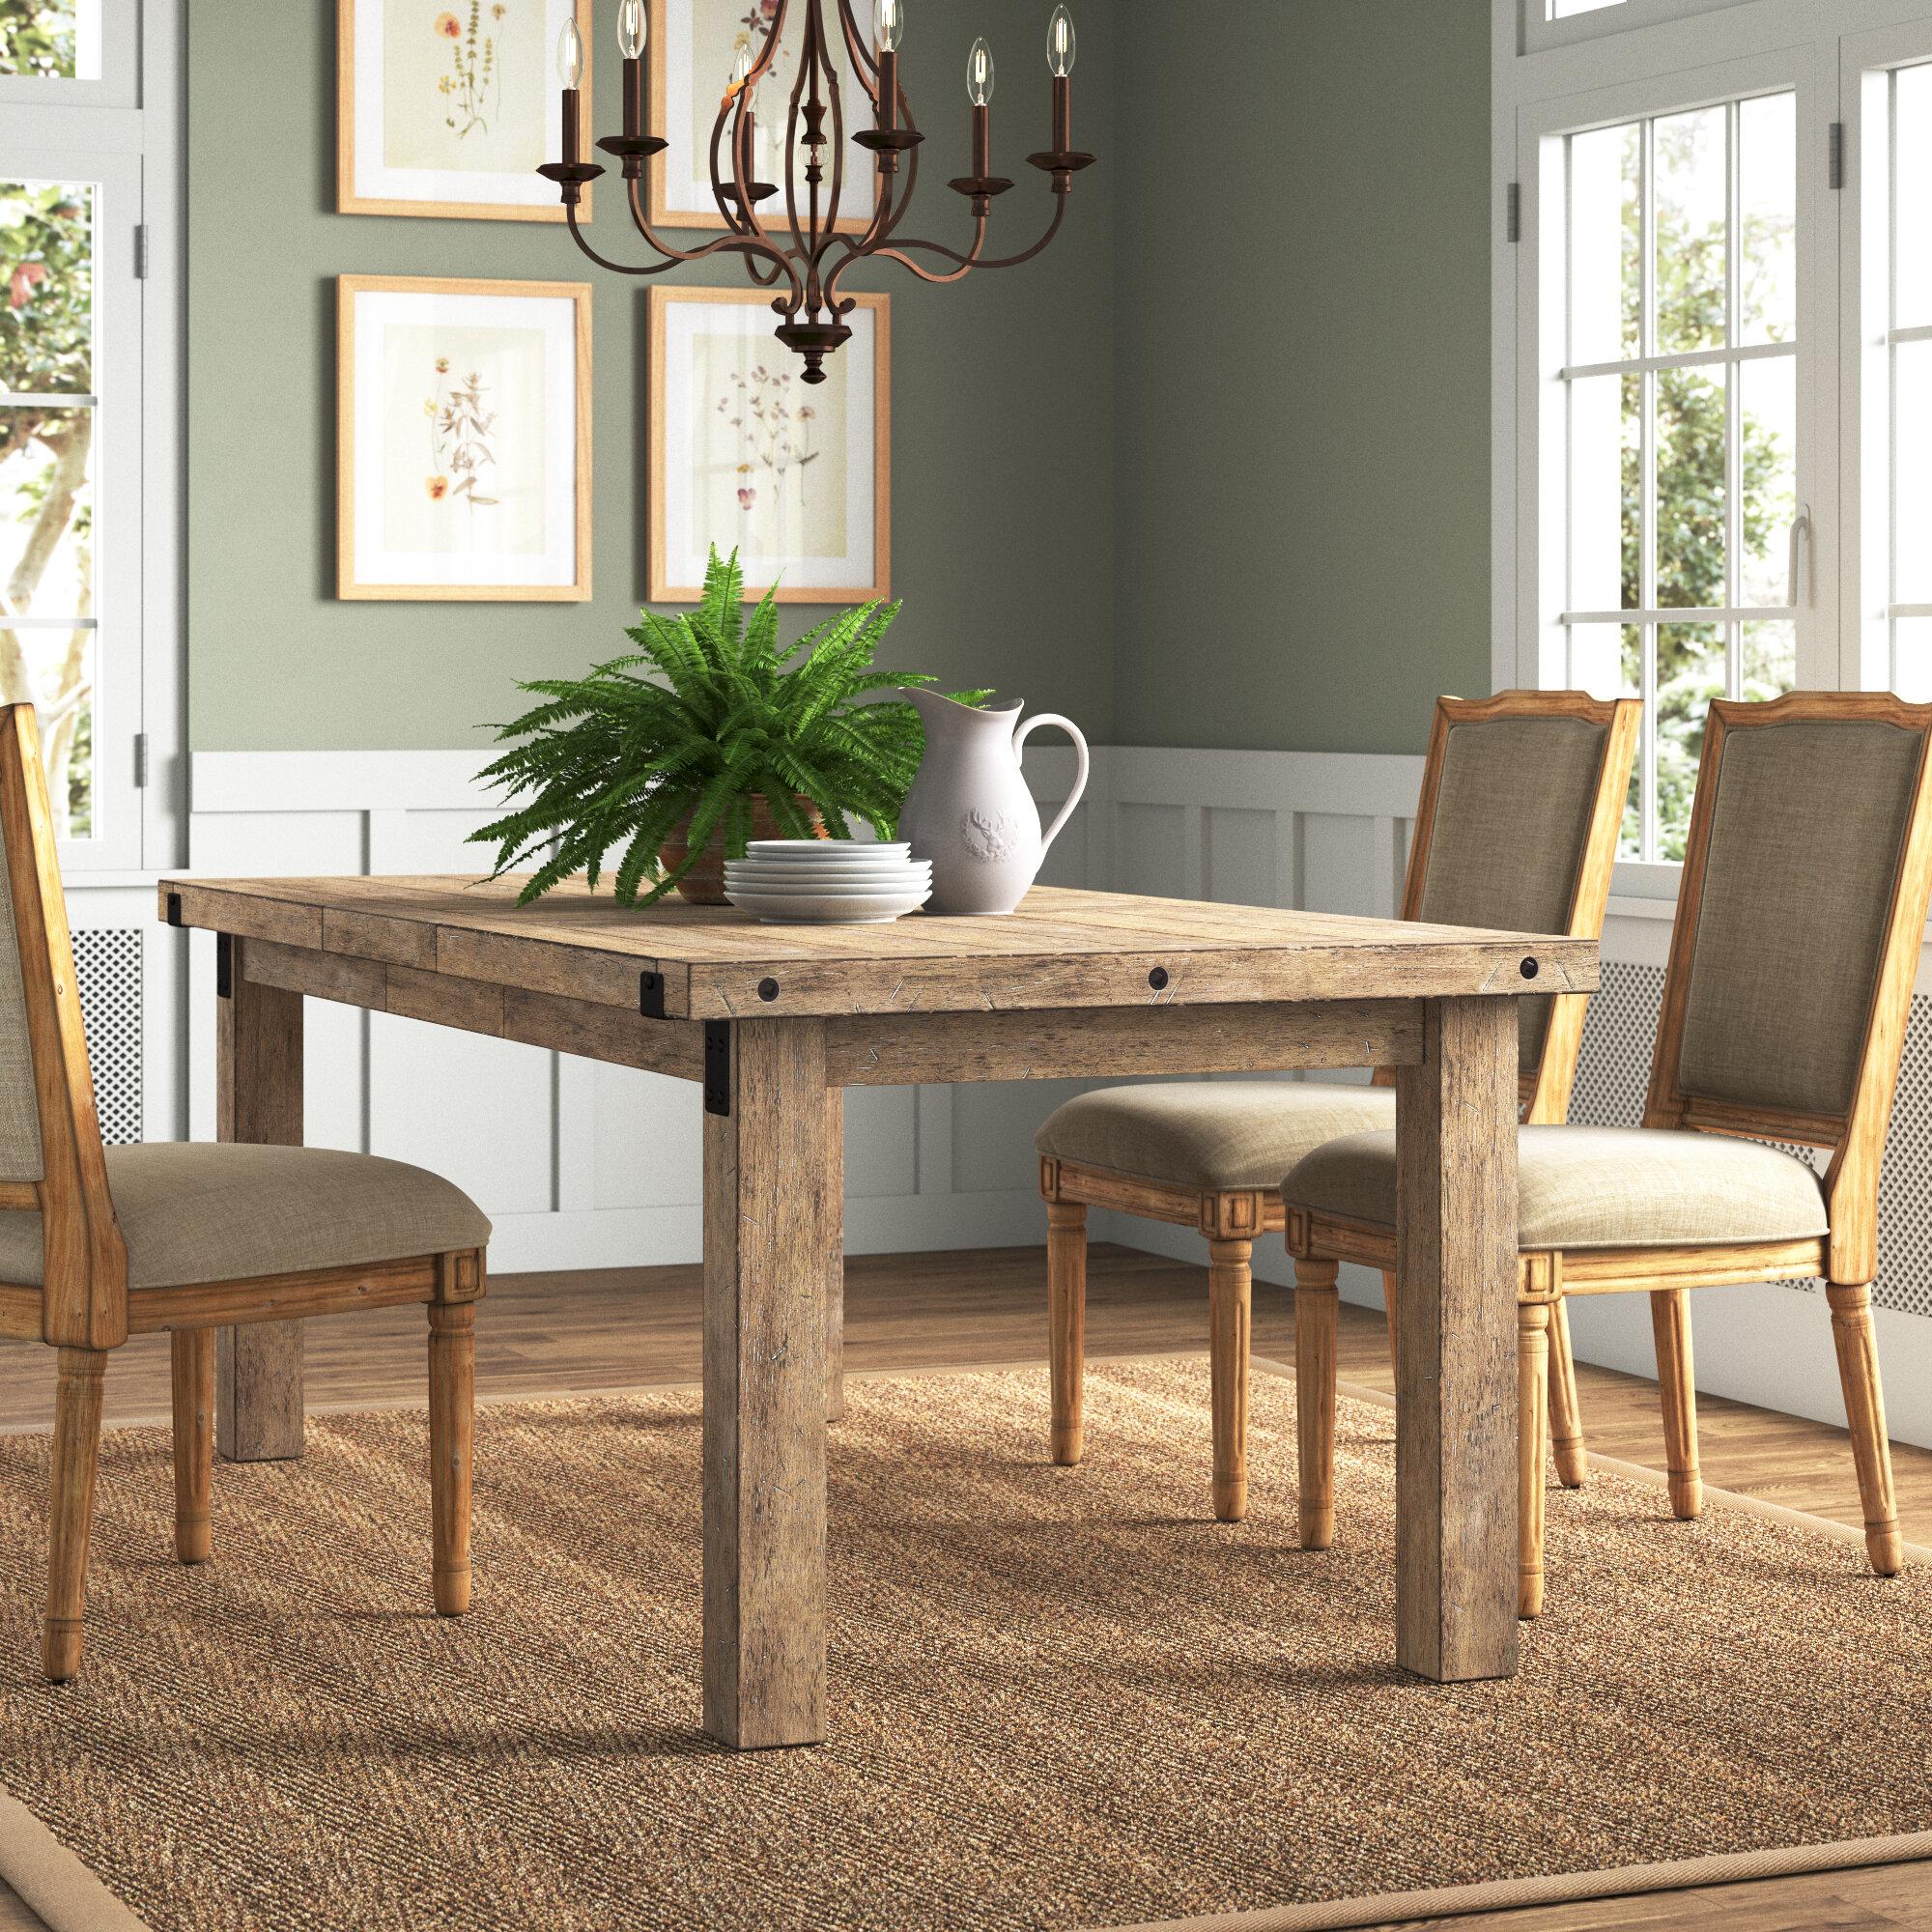 Laurel Foundry Modern Farmhouse Fort Oglethorpe Extendable Dining Table Reviews Wayfair Ca